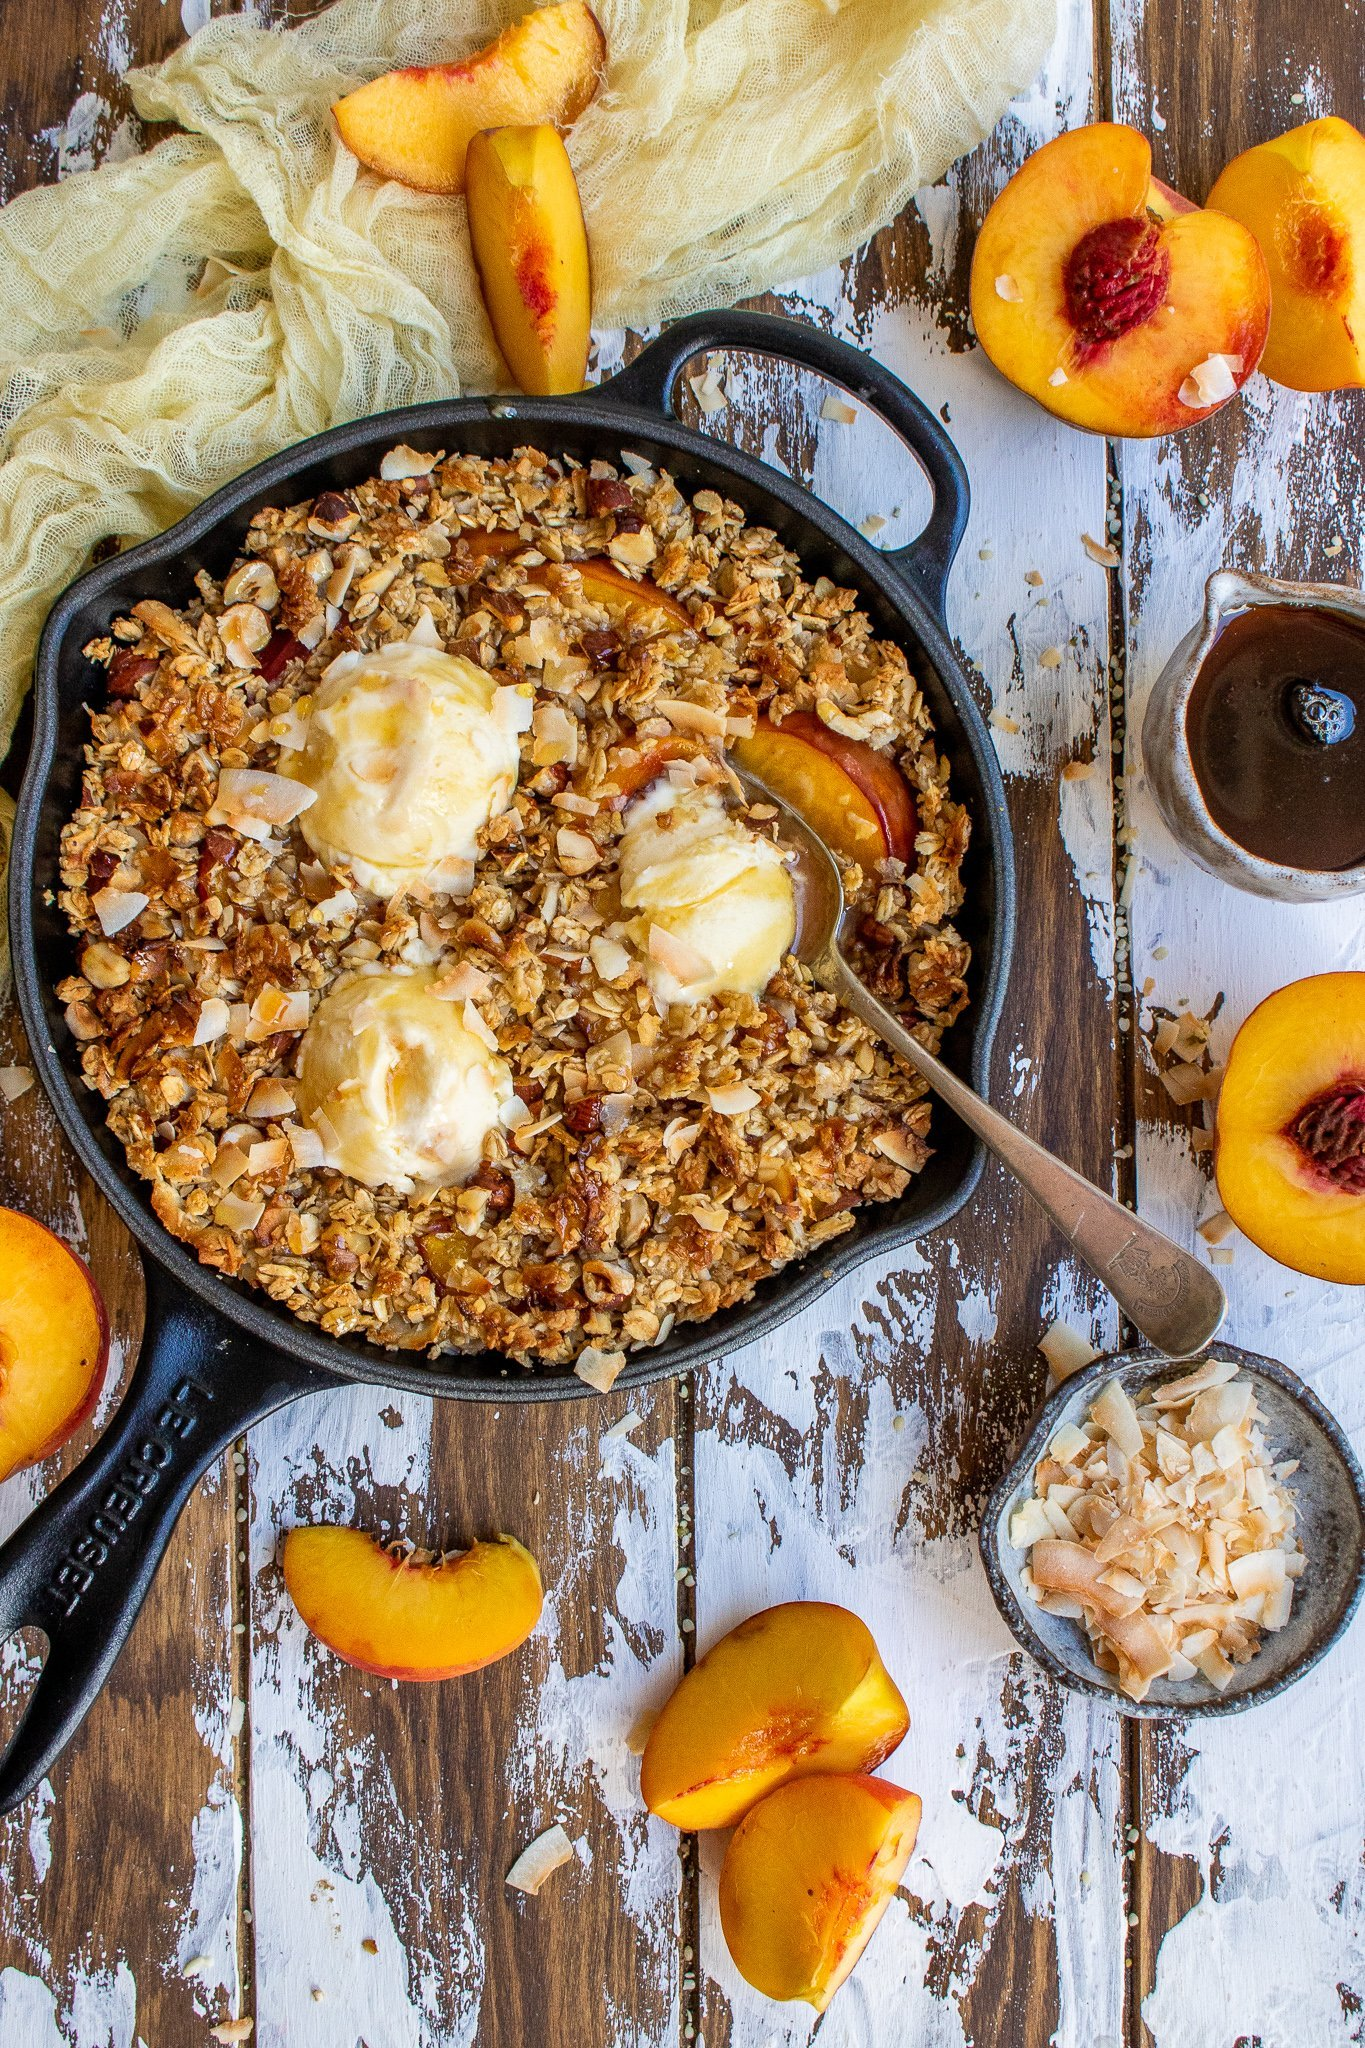 Peach & Coconut Crumble